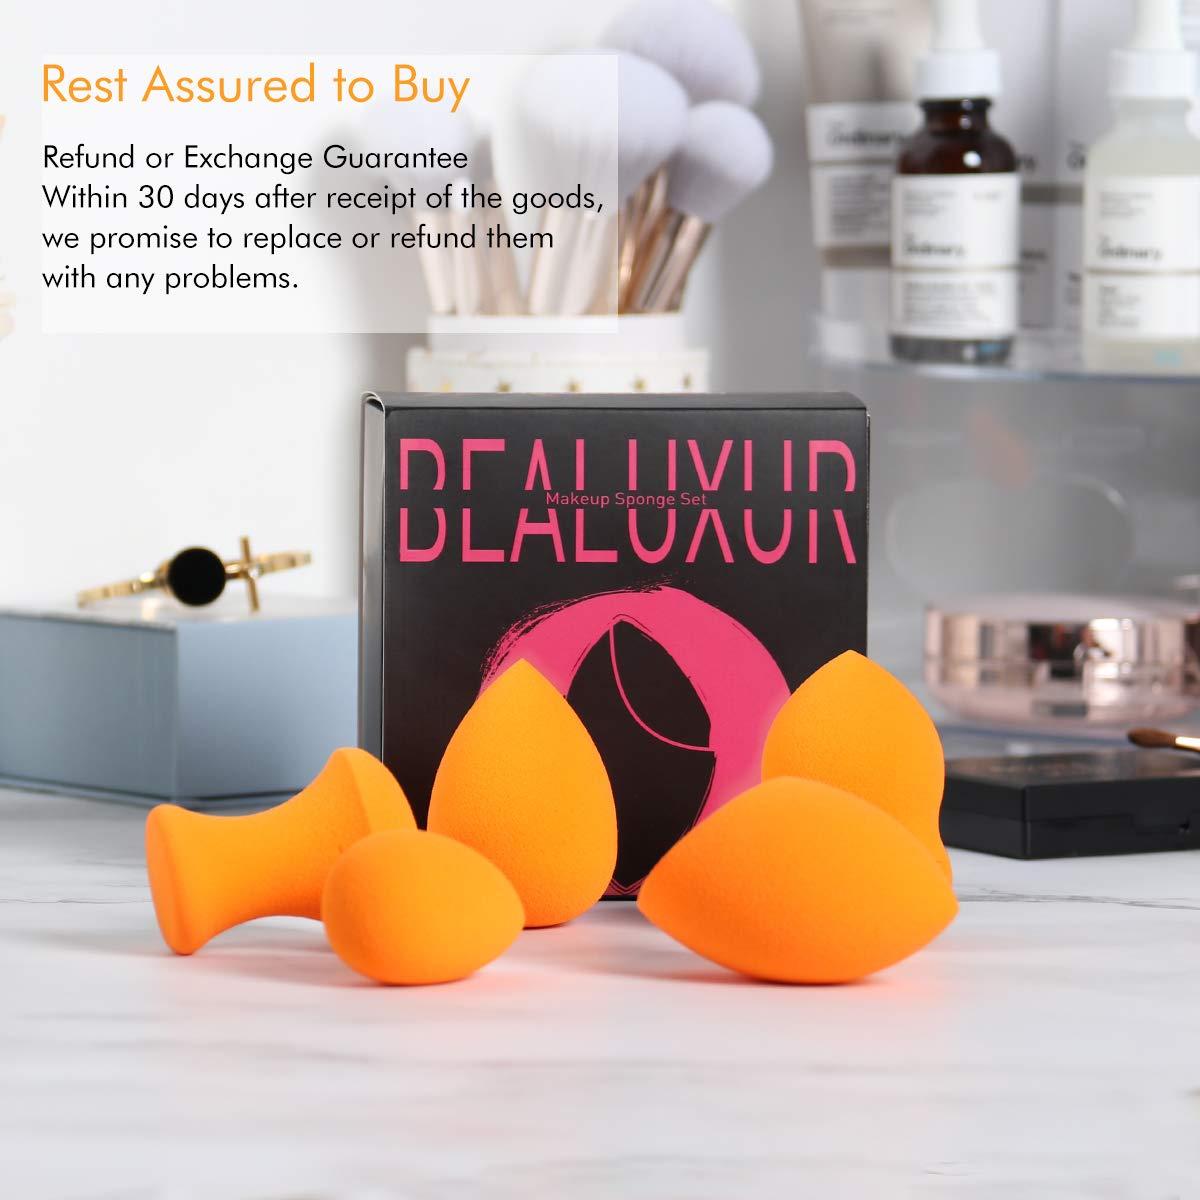 Makeup Sponge,Bealuxur Beauty Blender Sponge Foundation Sponge MakeUp Set With Foam Technology Multi Shape Beauty Sponges (5 Pcs)